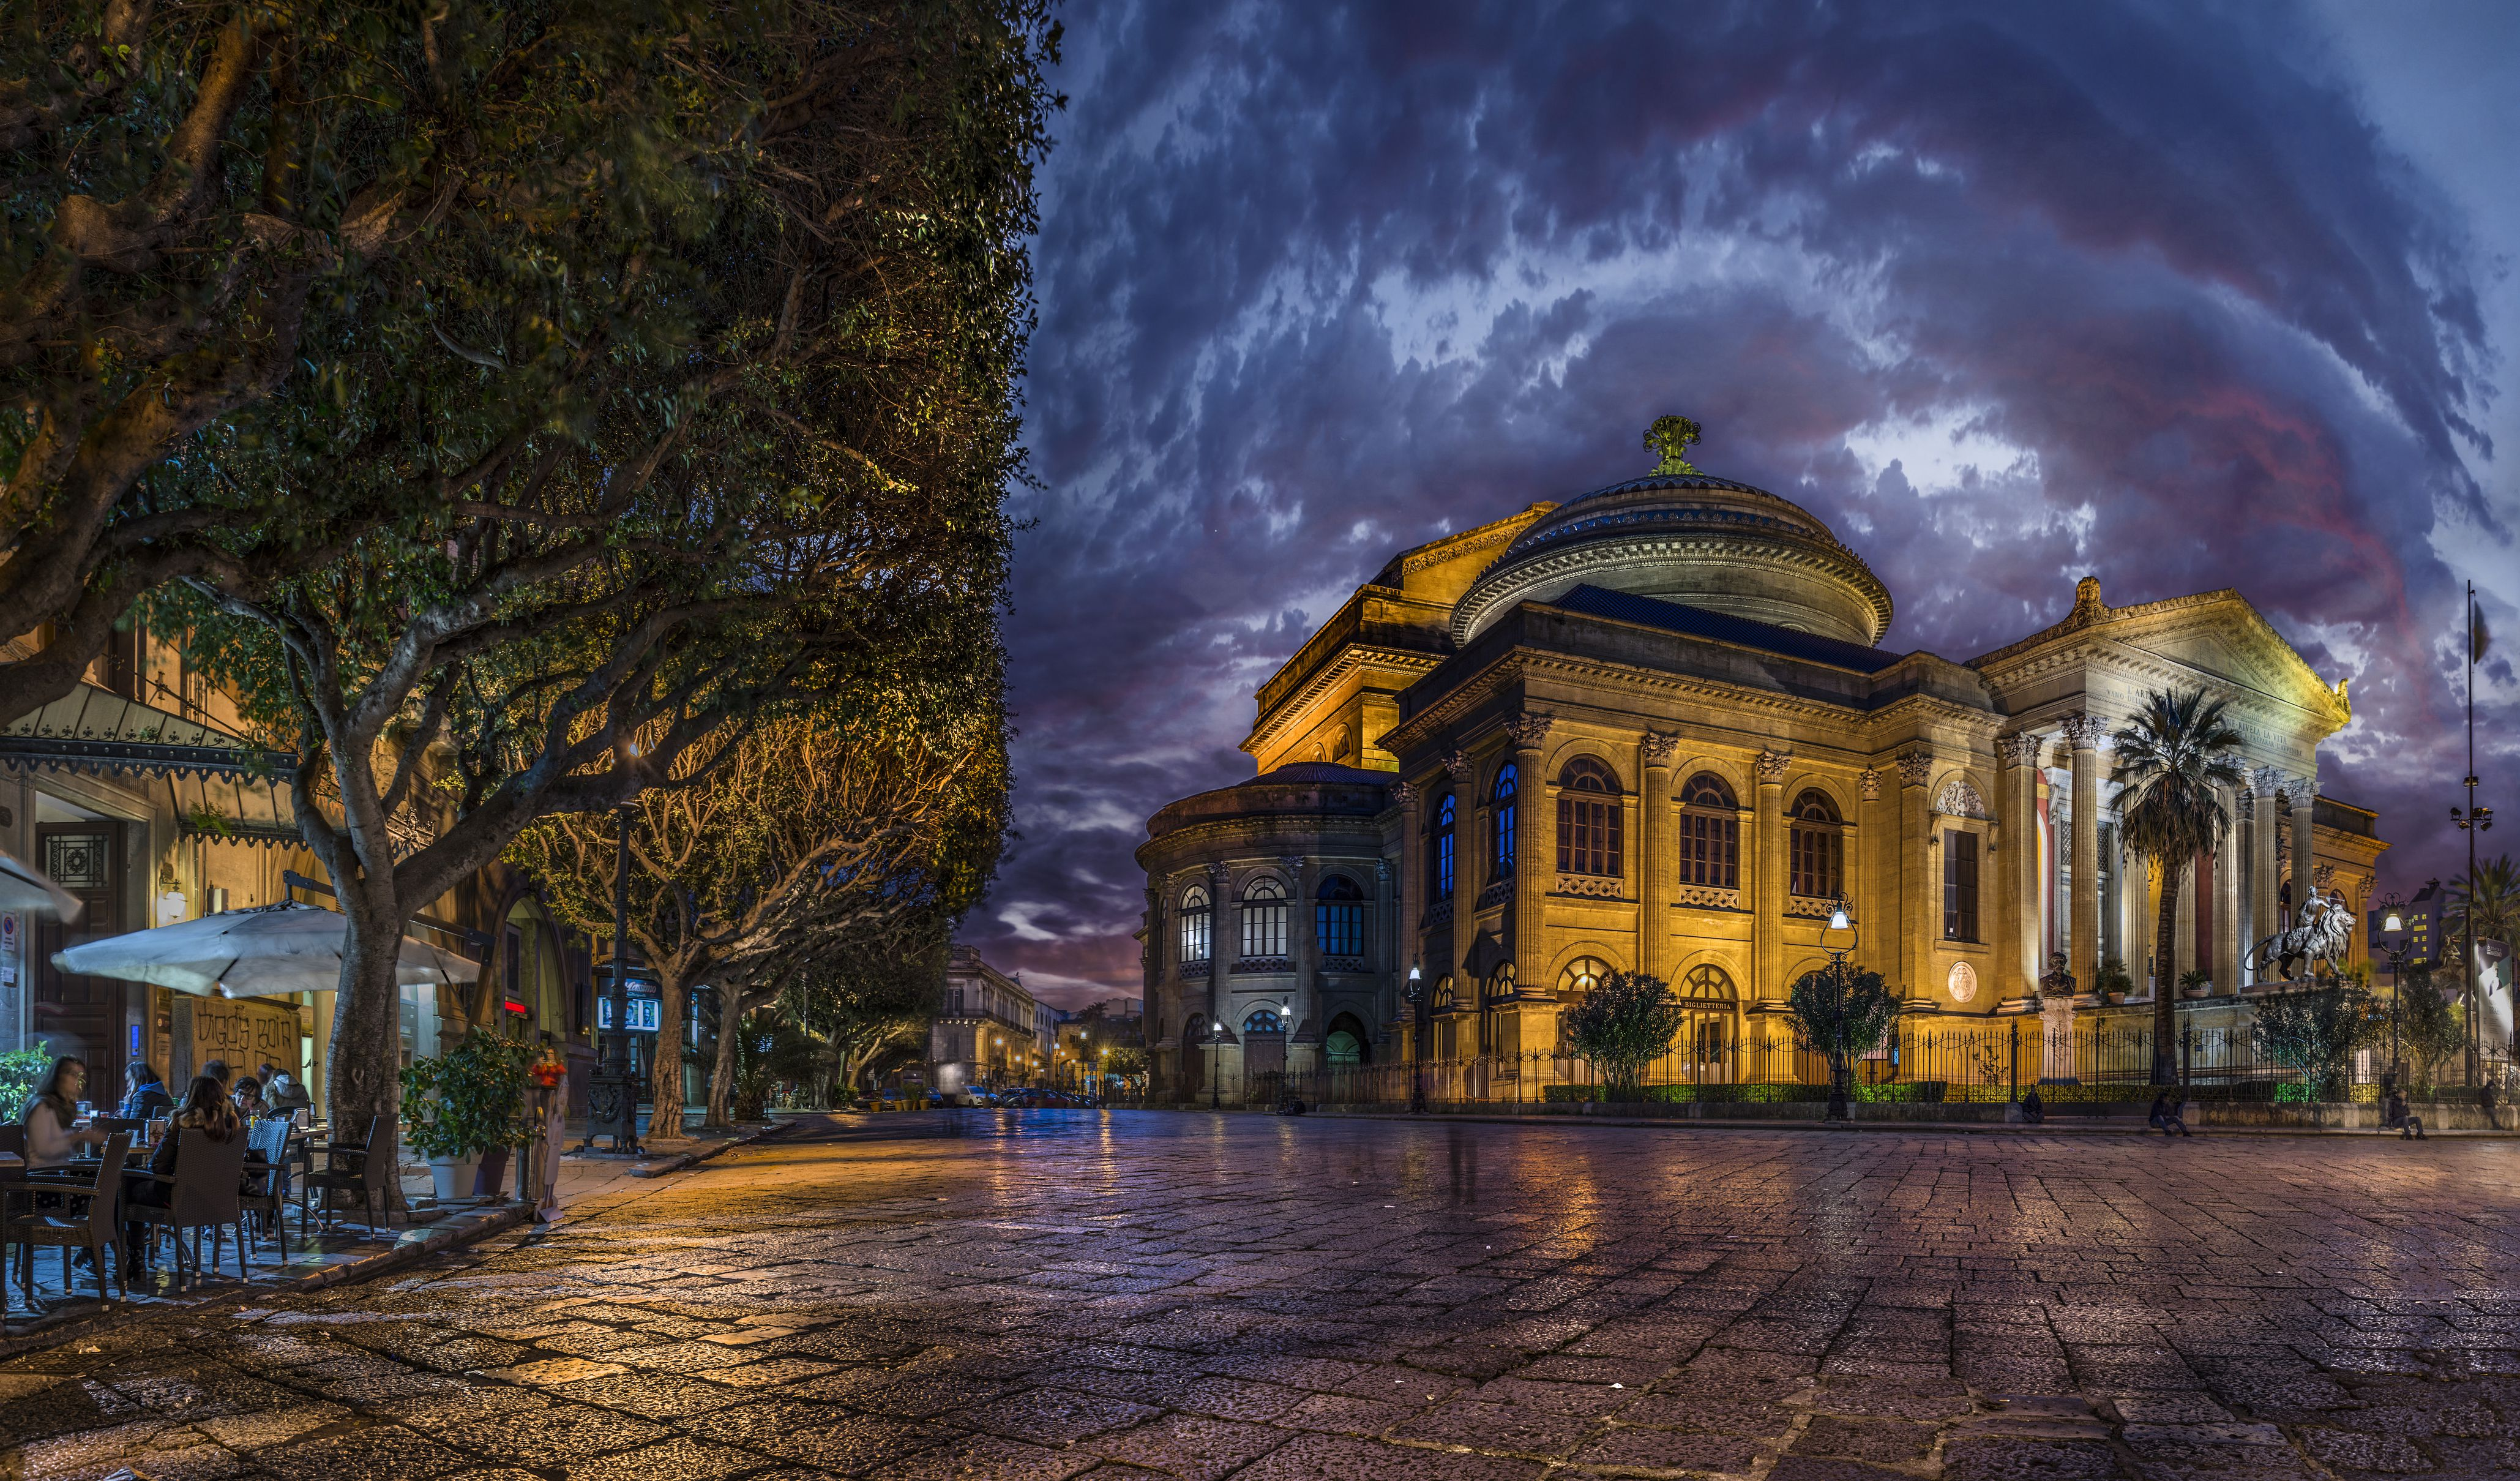 Theater, Teatro Massimo, Palermo, Sicily, Italy